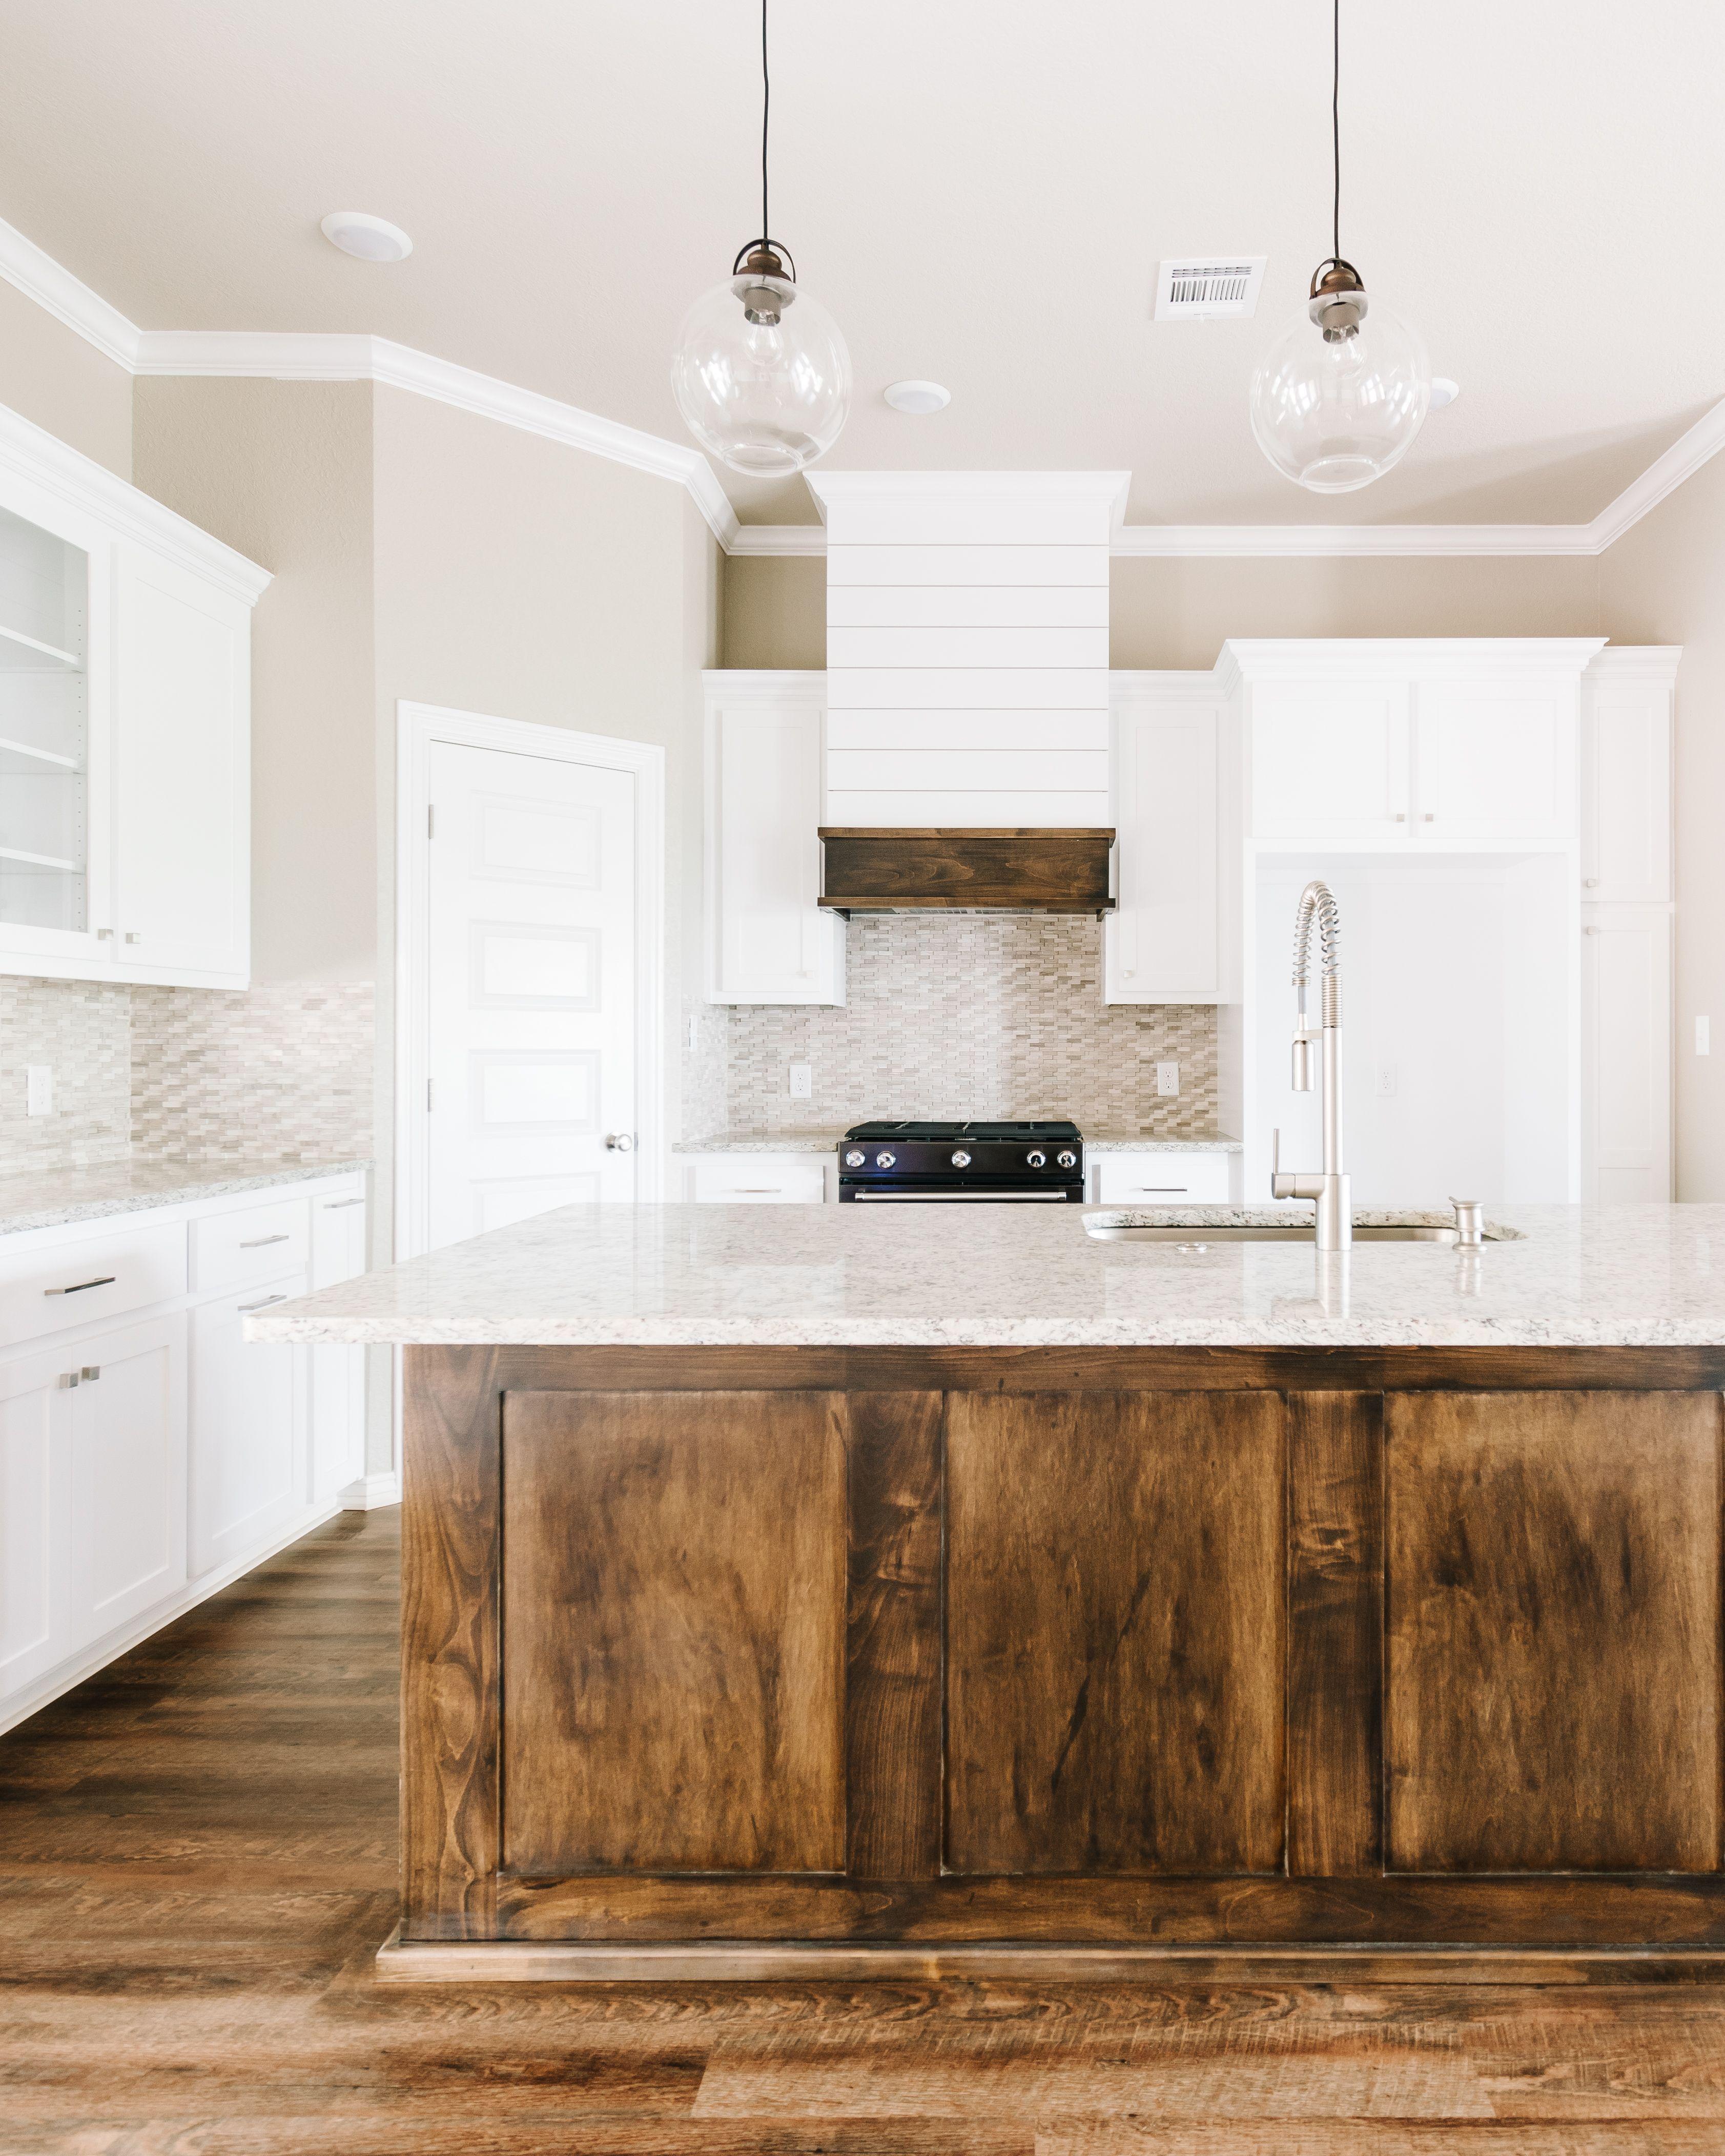 Modern white rustic kitchen featuring custom shaker